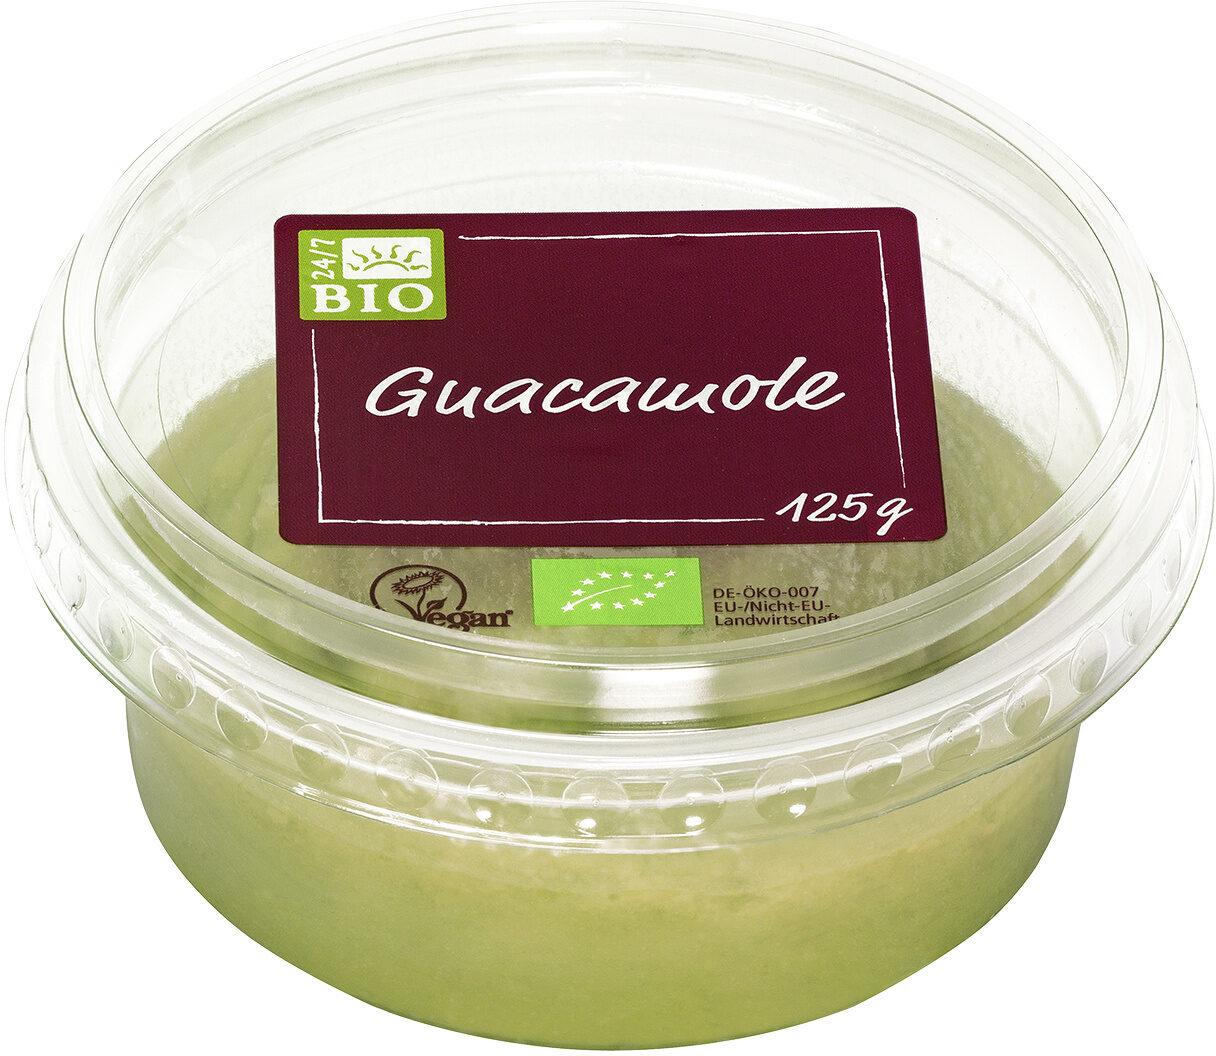 Guacamole - Produkt - de